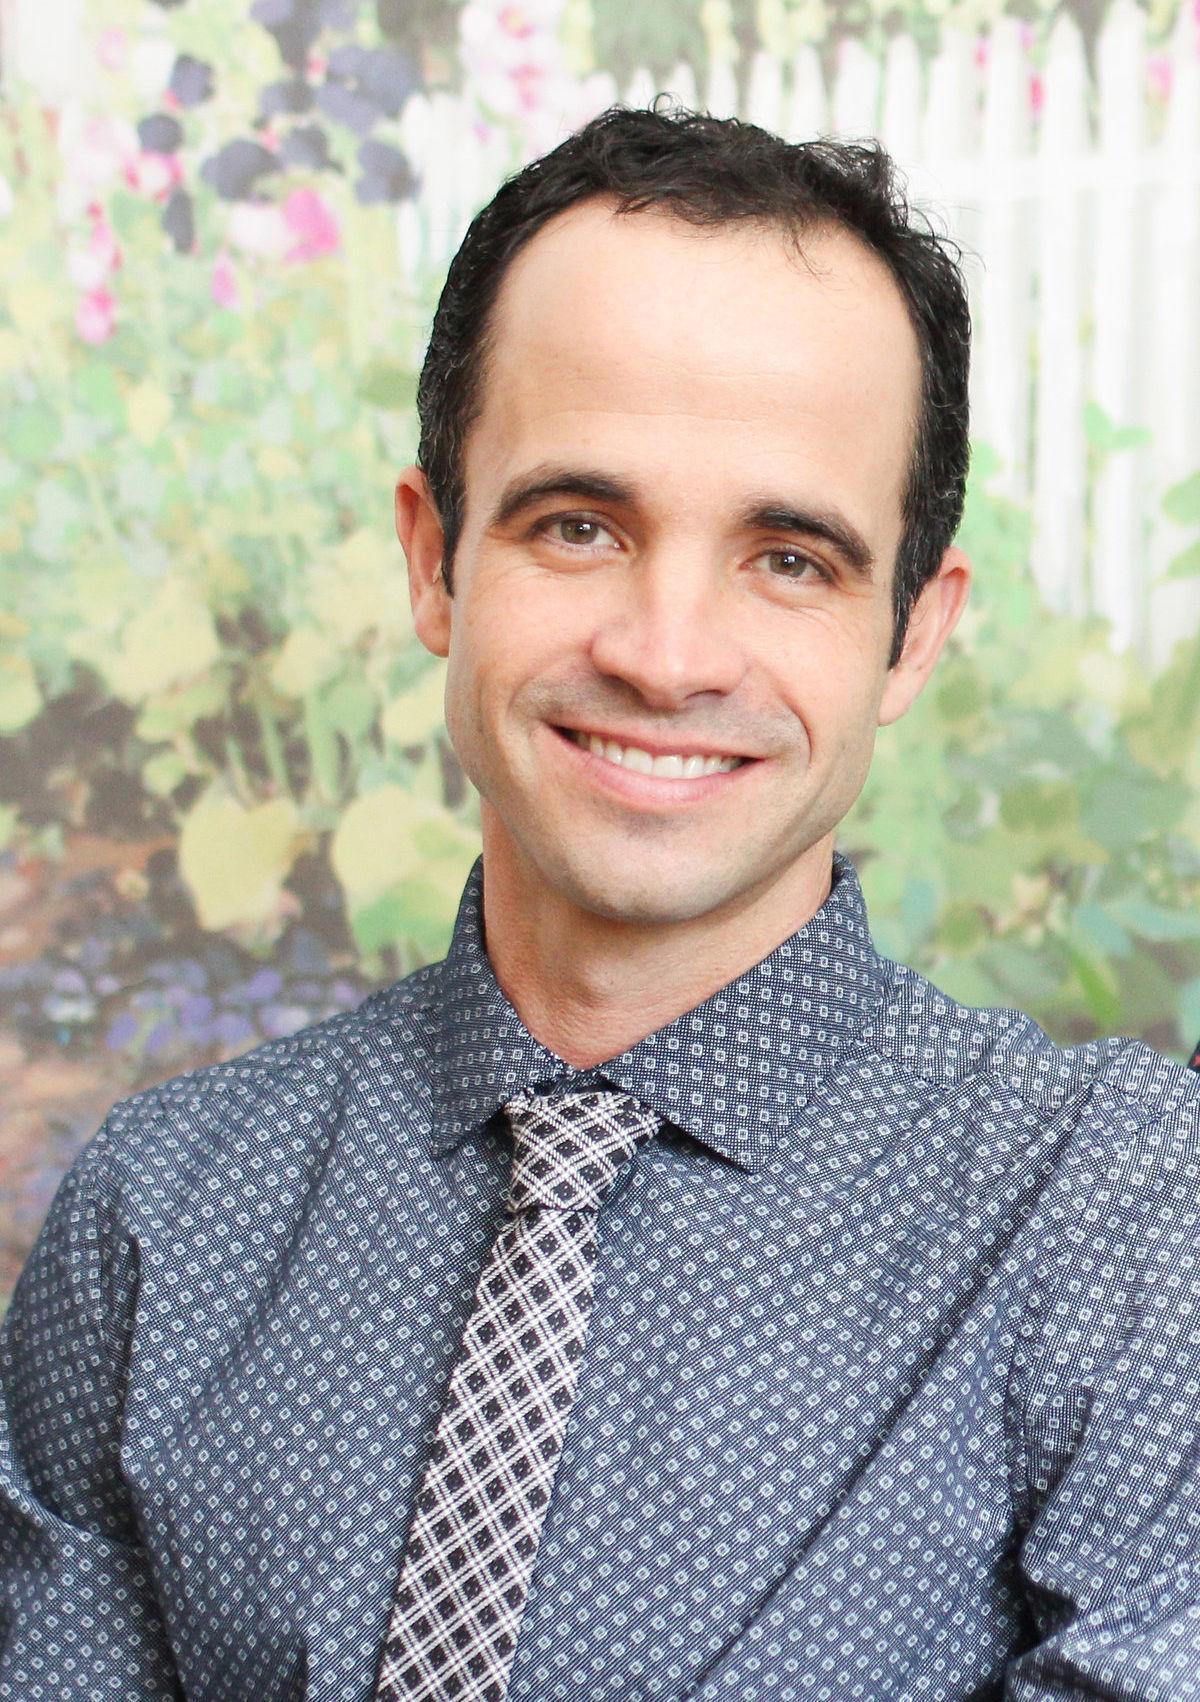 Lucas Tatham